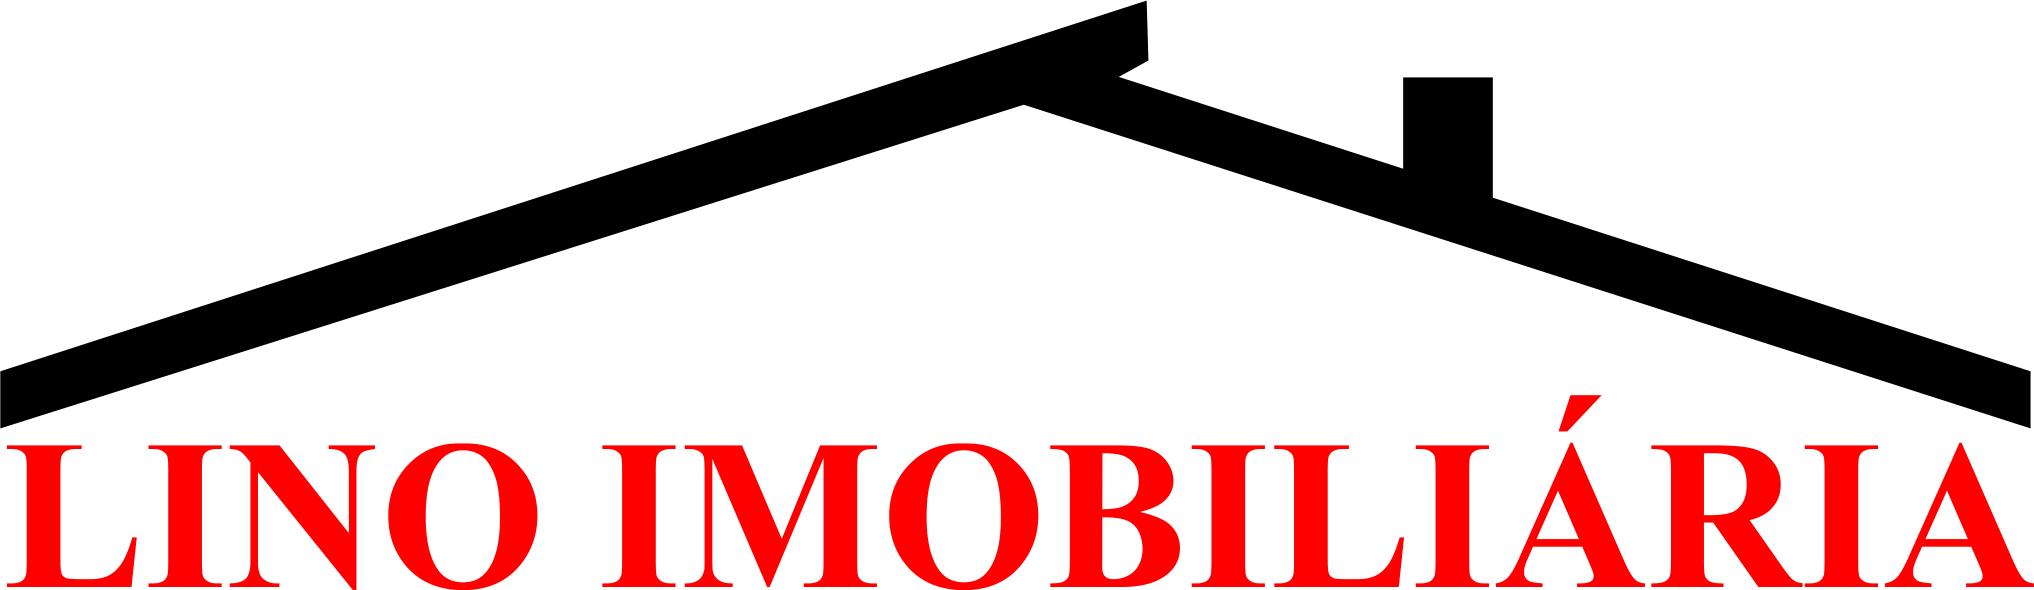 L & A Negócios Imobiliarios Ltda Me